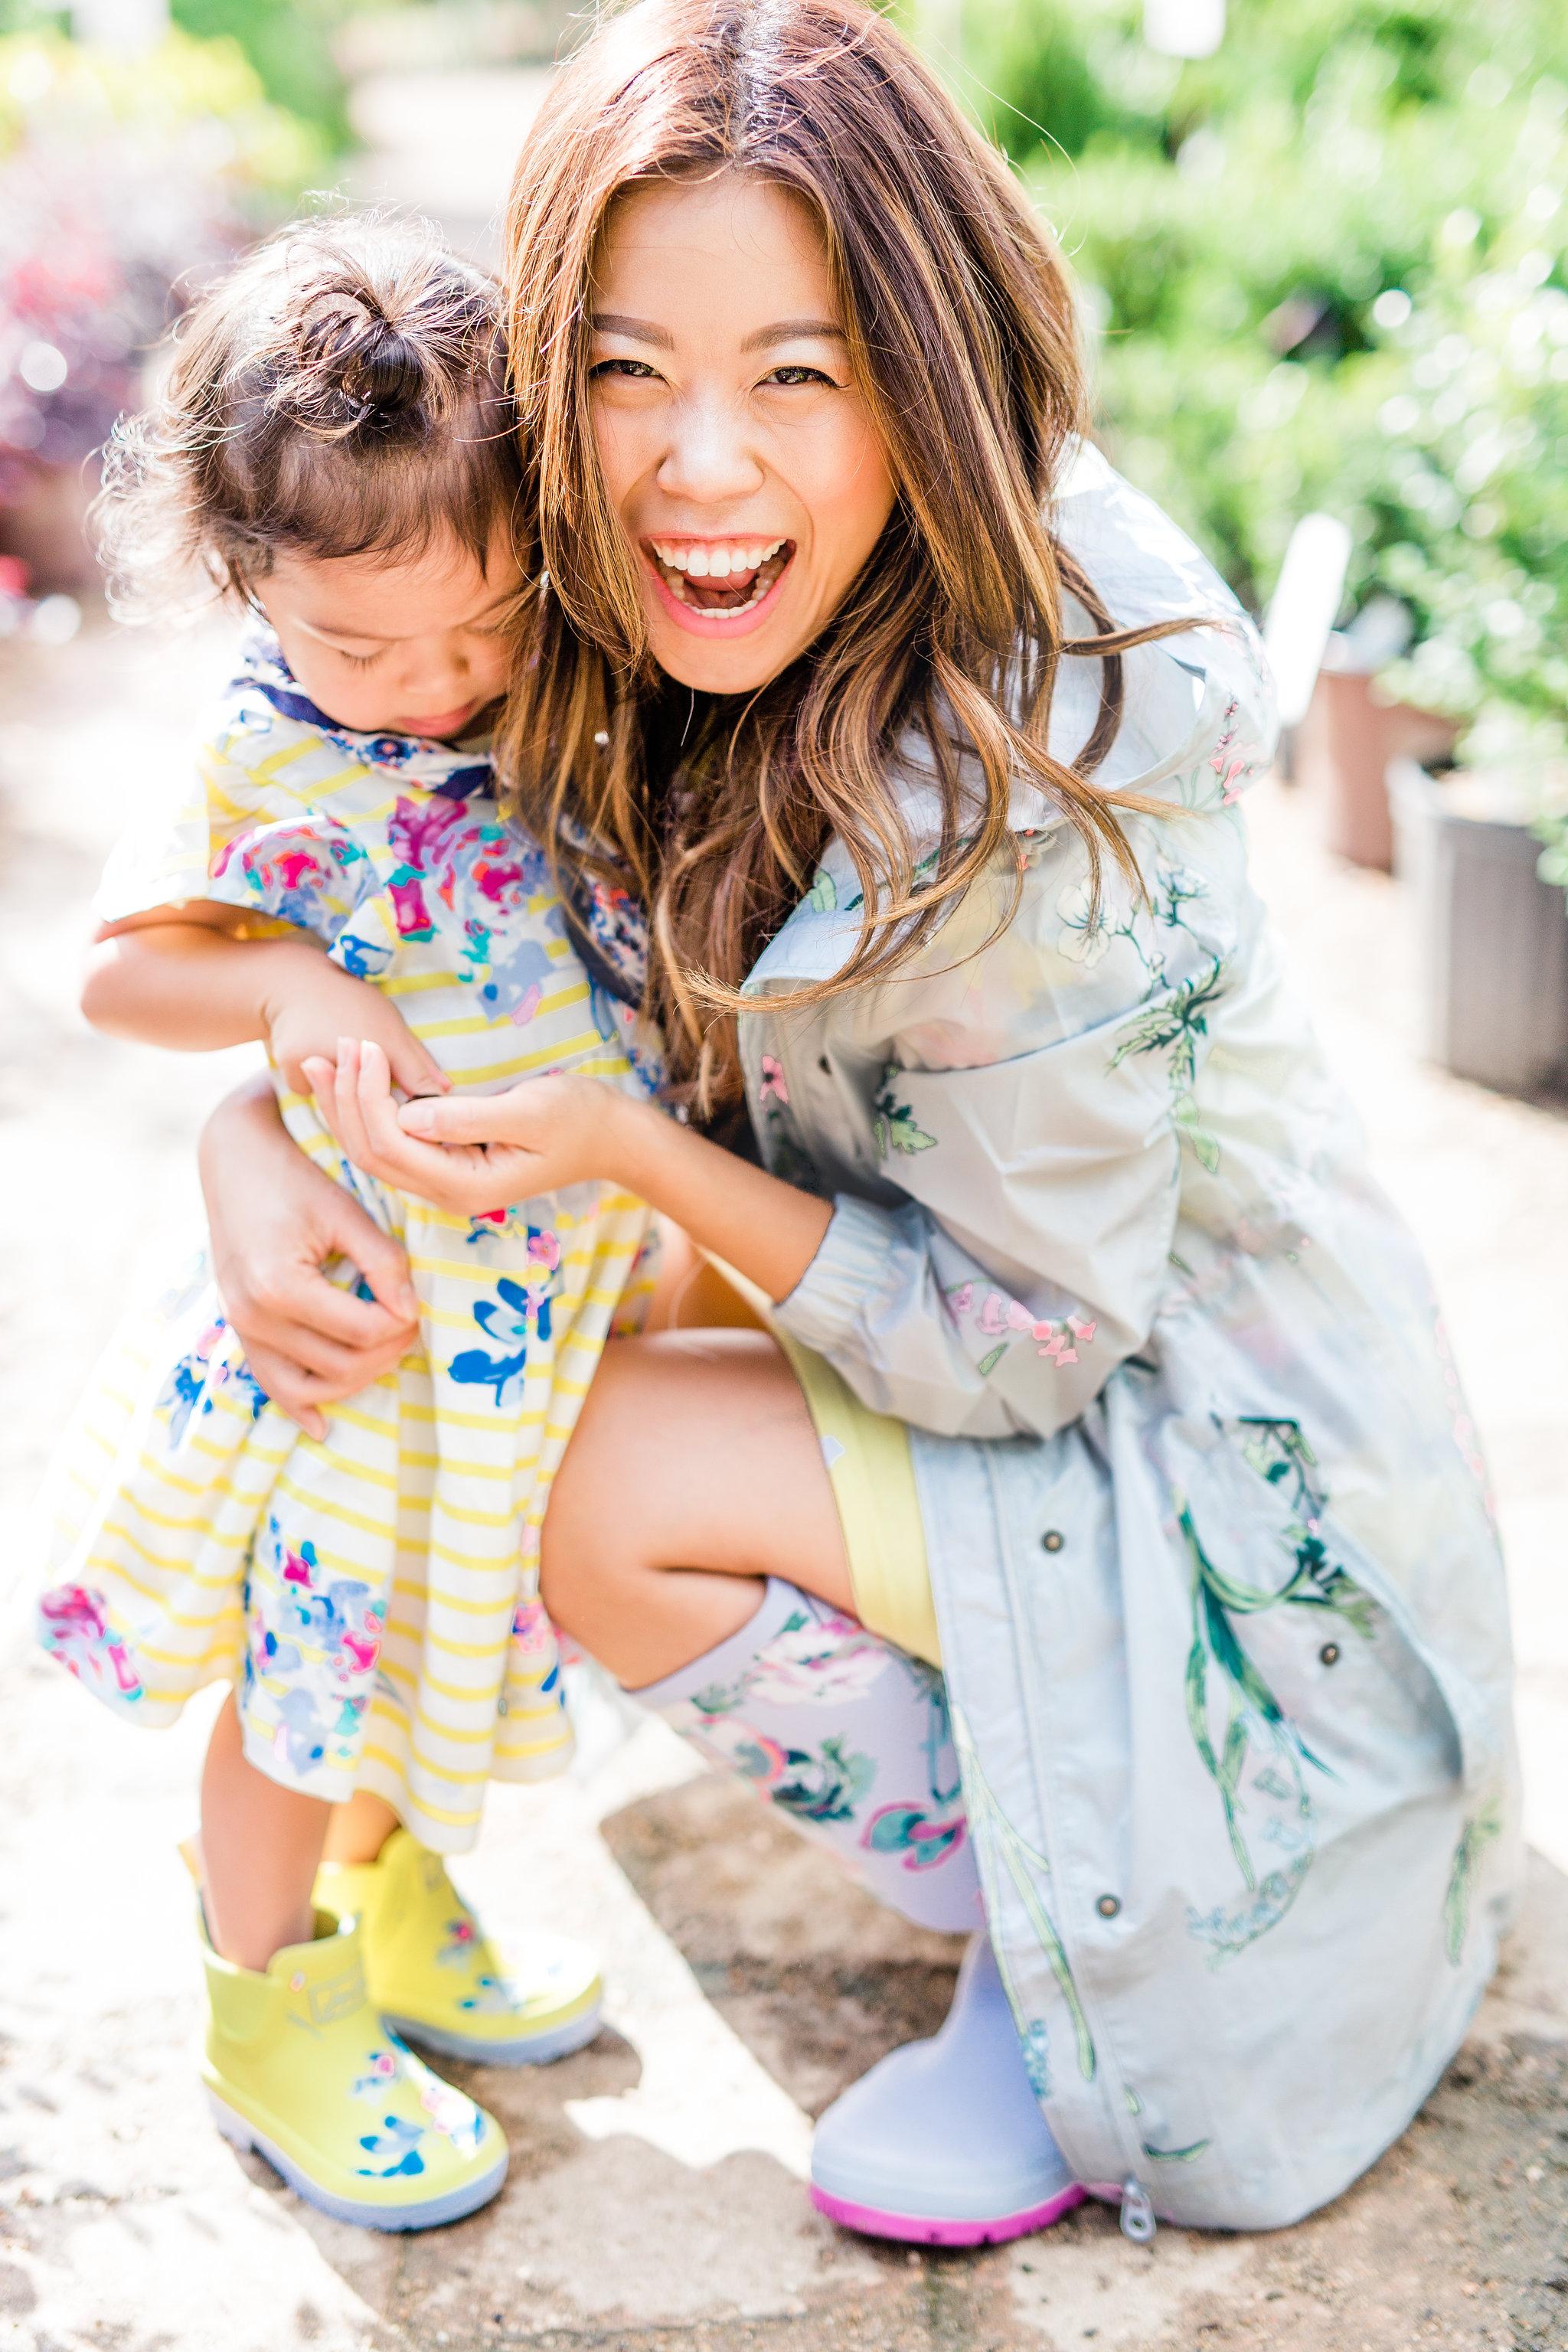 Joules Go Lightly Botanical Print Rain coat with matching wellies mommy and me Joyfullygreen  .jpg